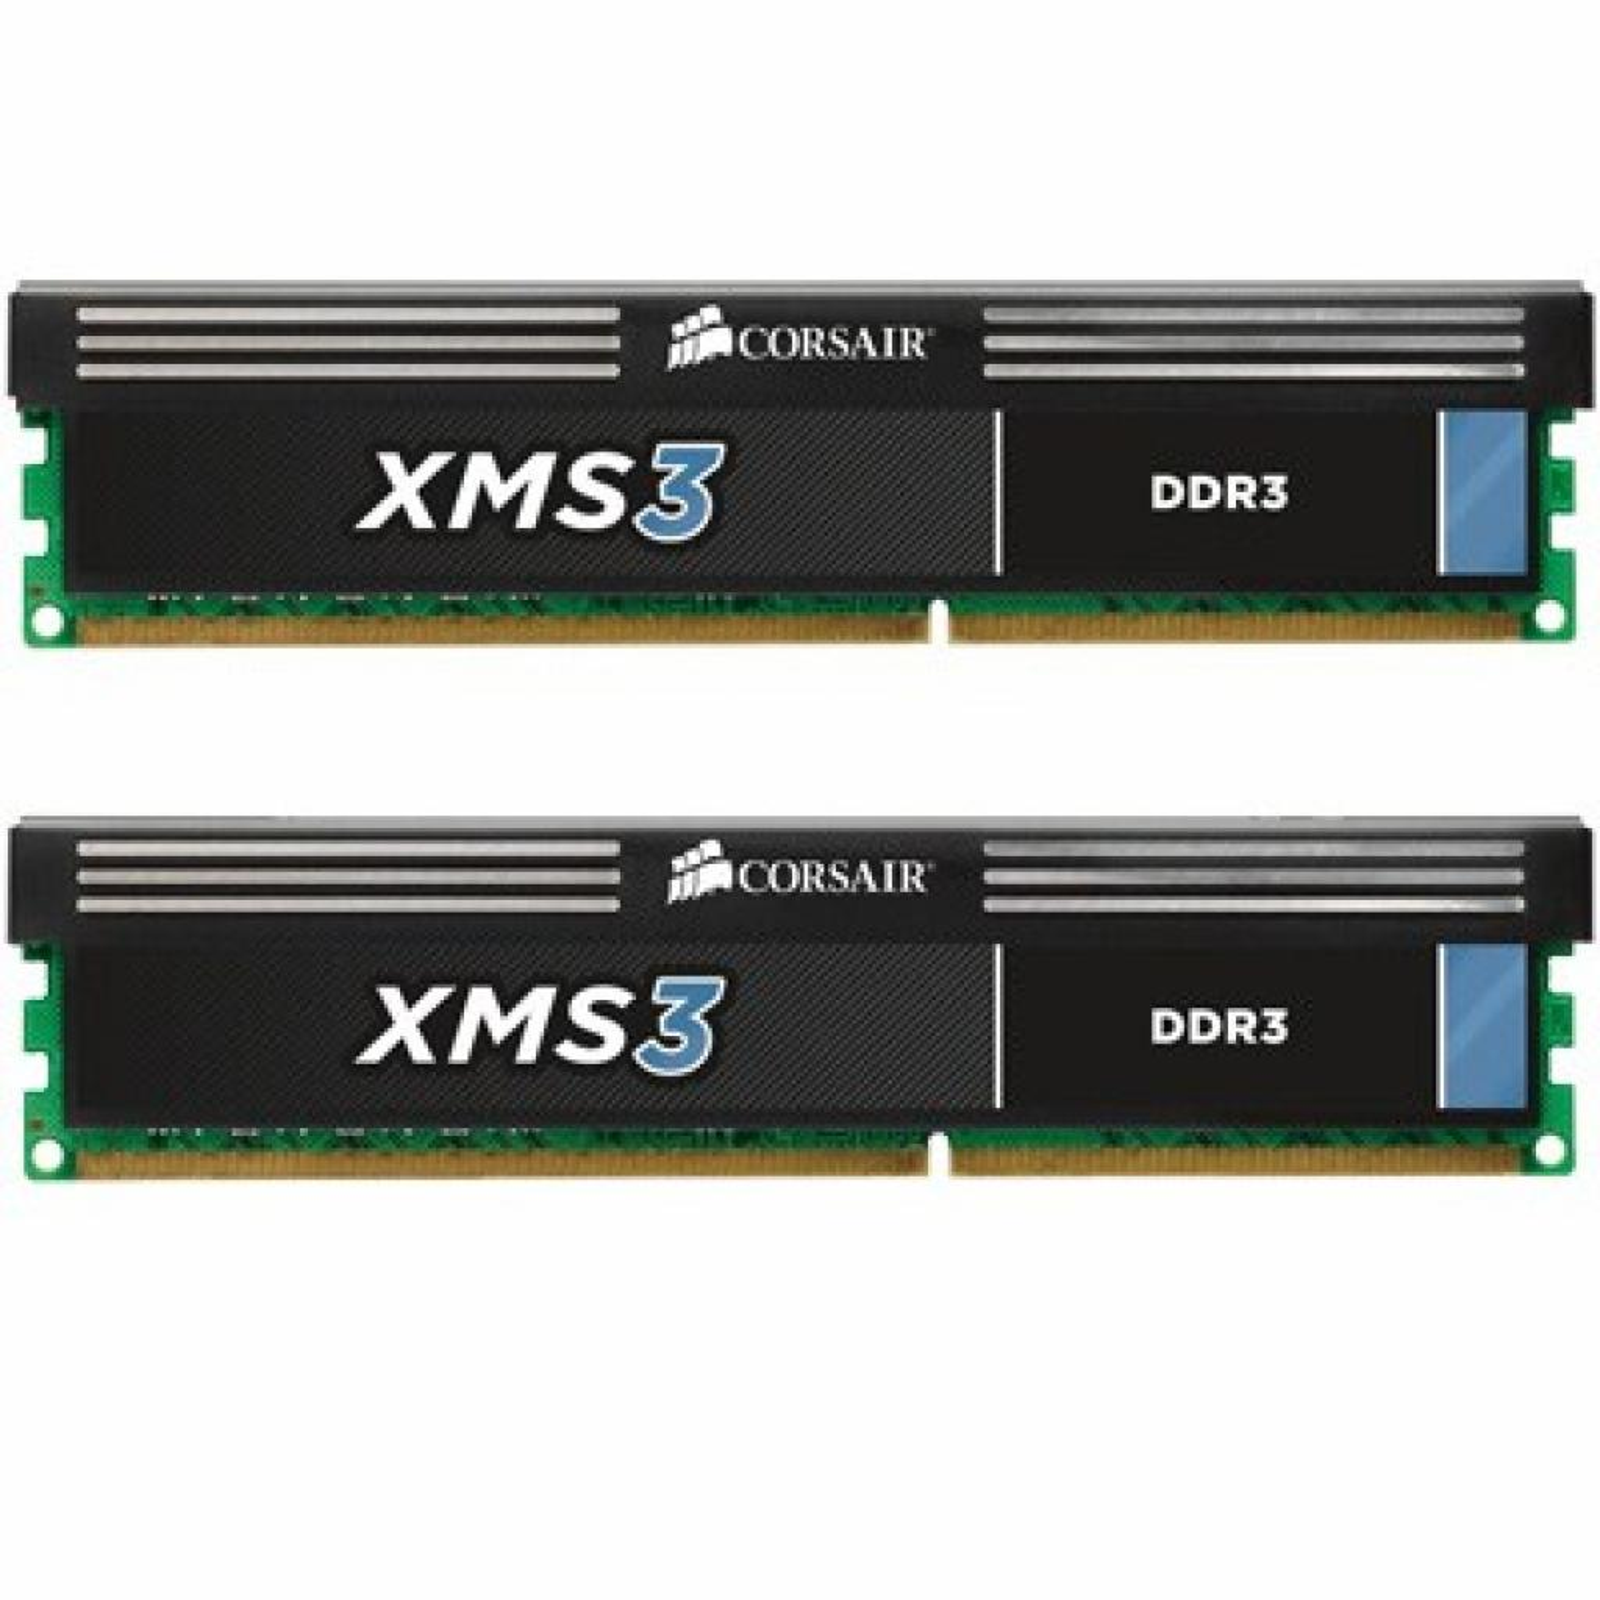 Модуль памяти для компьютера DDR3 8GB (2x4GB) 2000 MHz CORSAIR (CMX8GX3M2A2000C9)